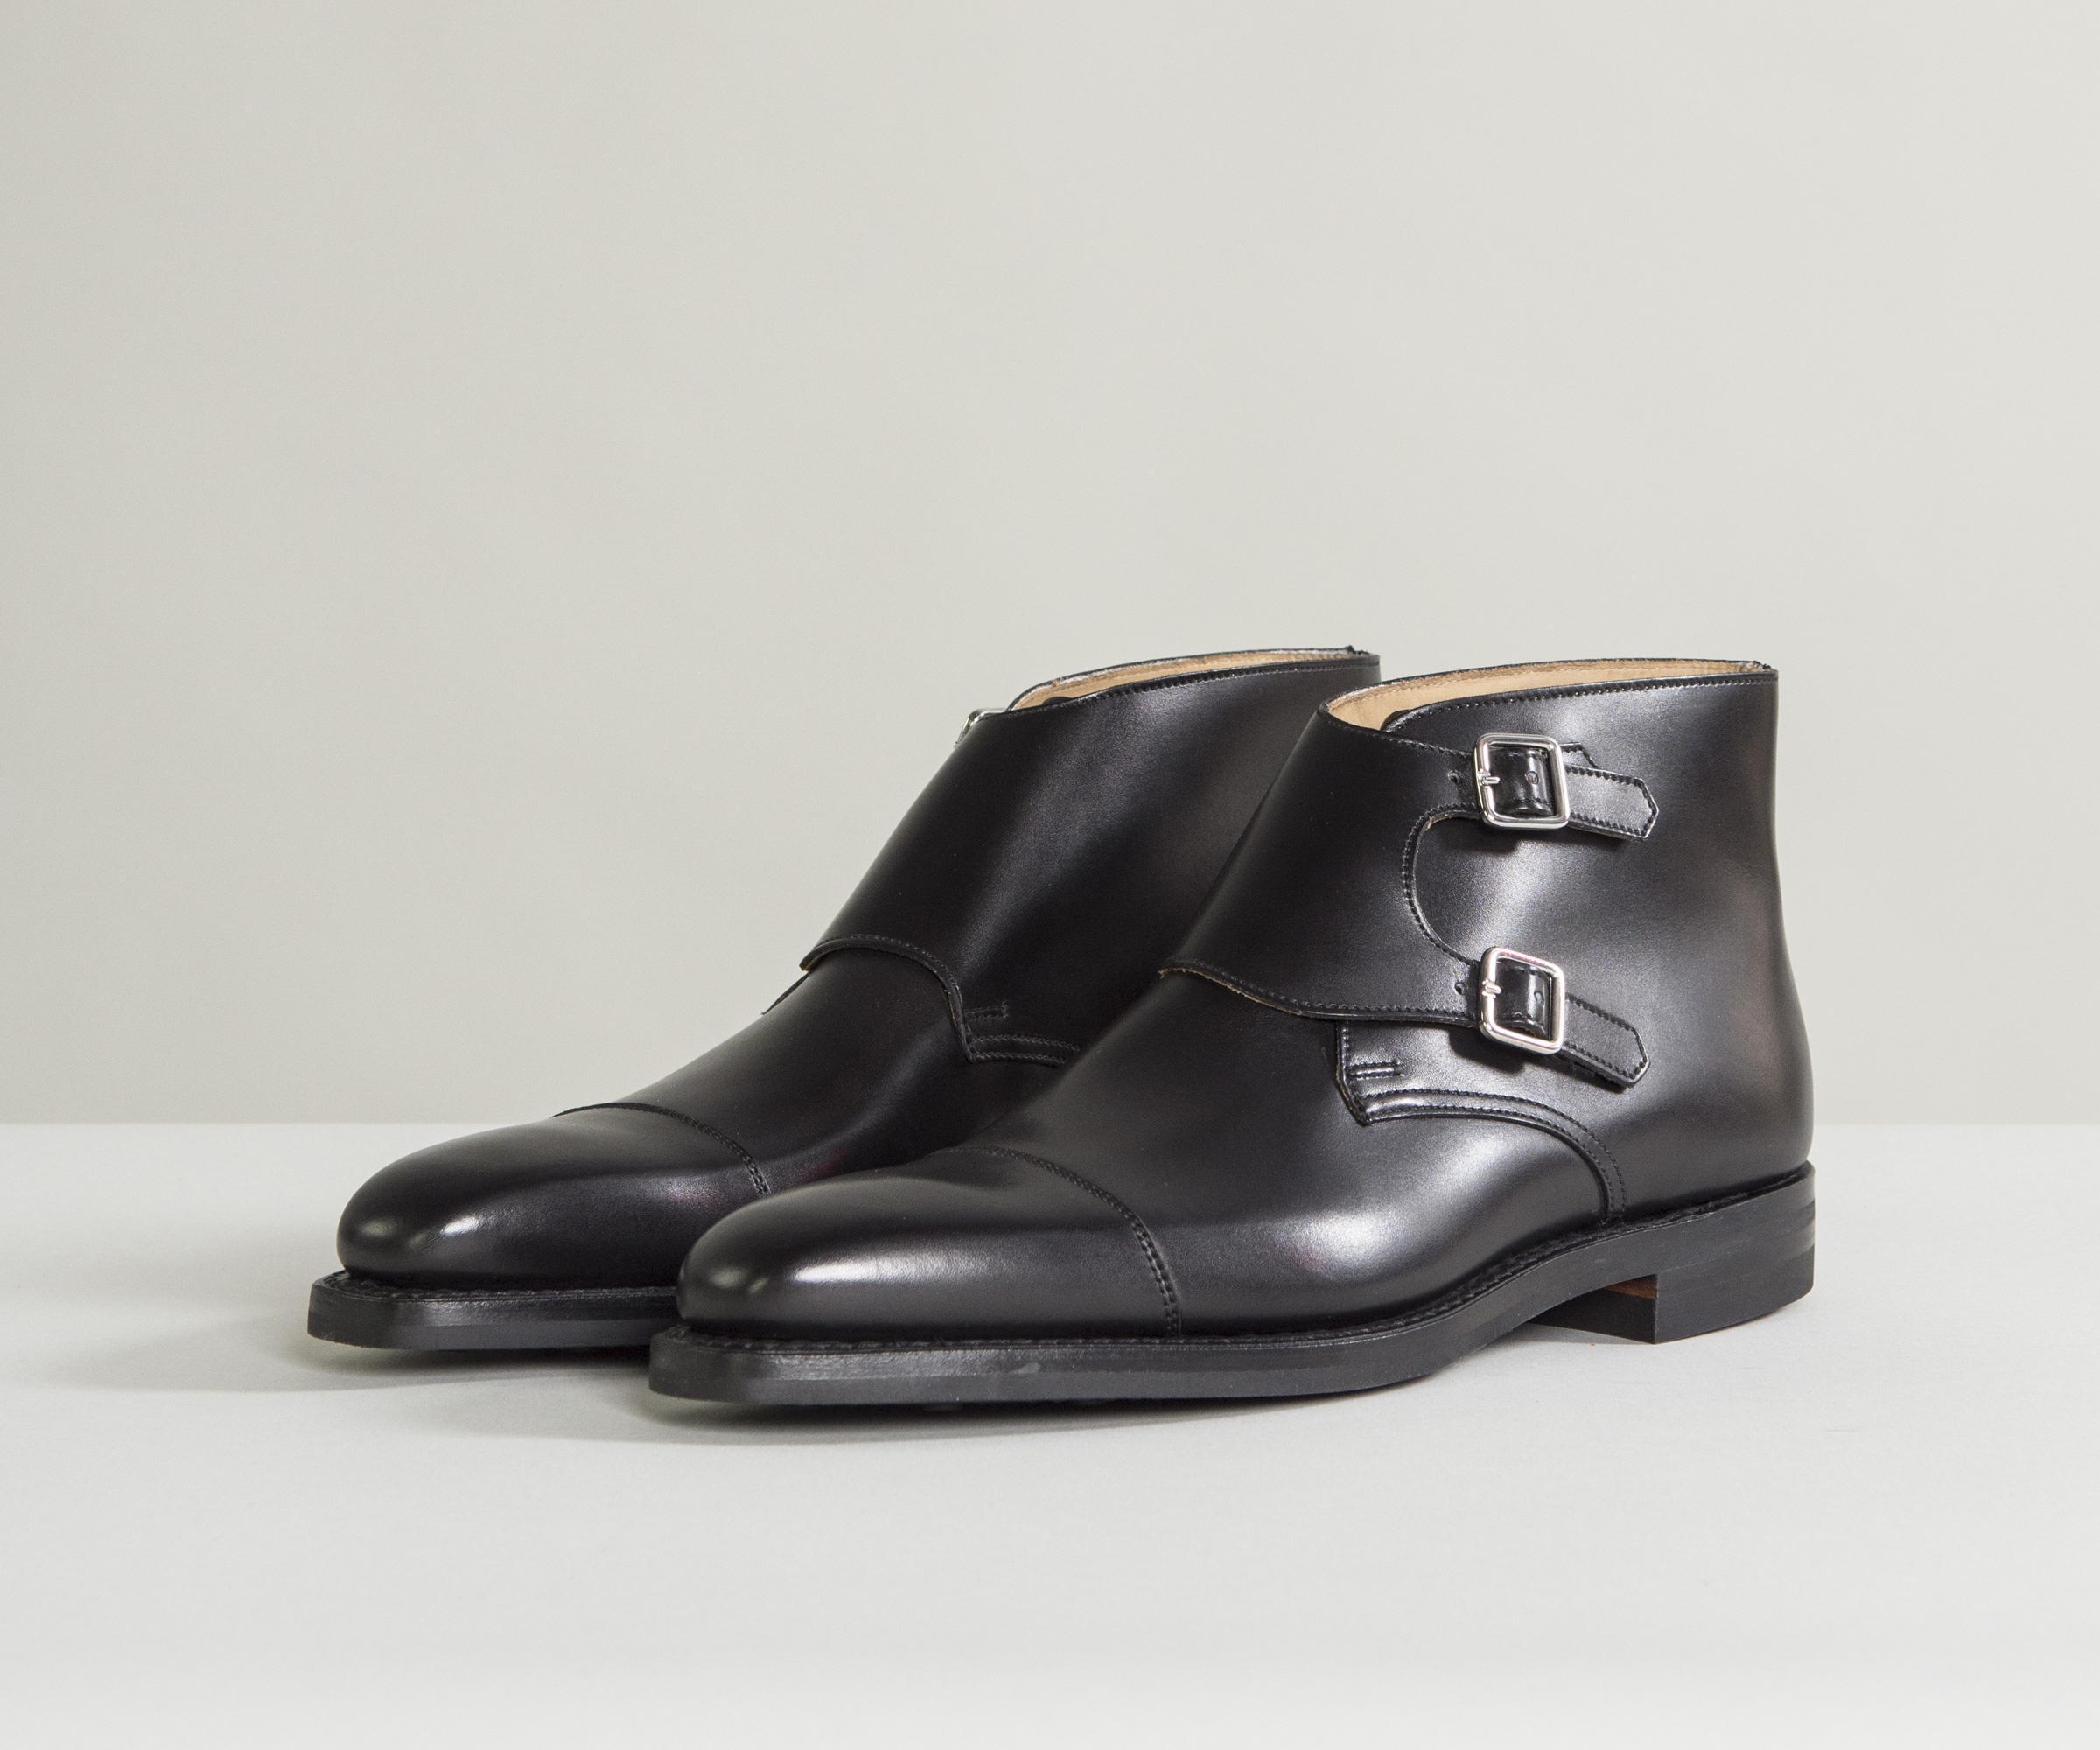 Camberley Burnished Calf Leather Boots Brown Crockett & Jones znBVmPrkN